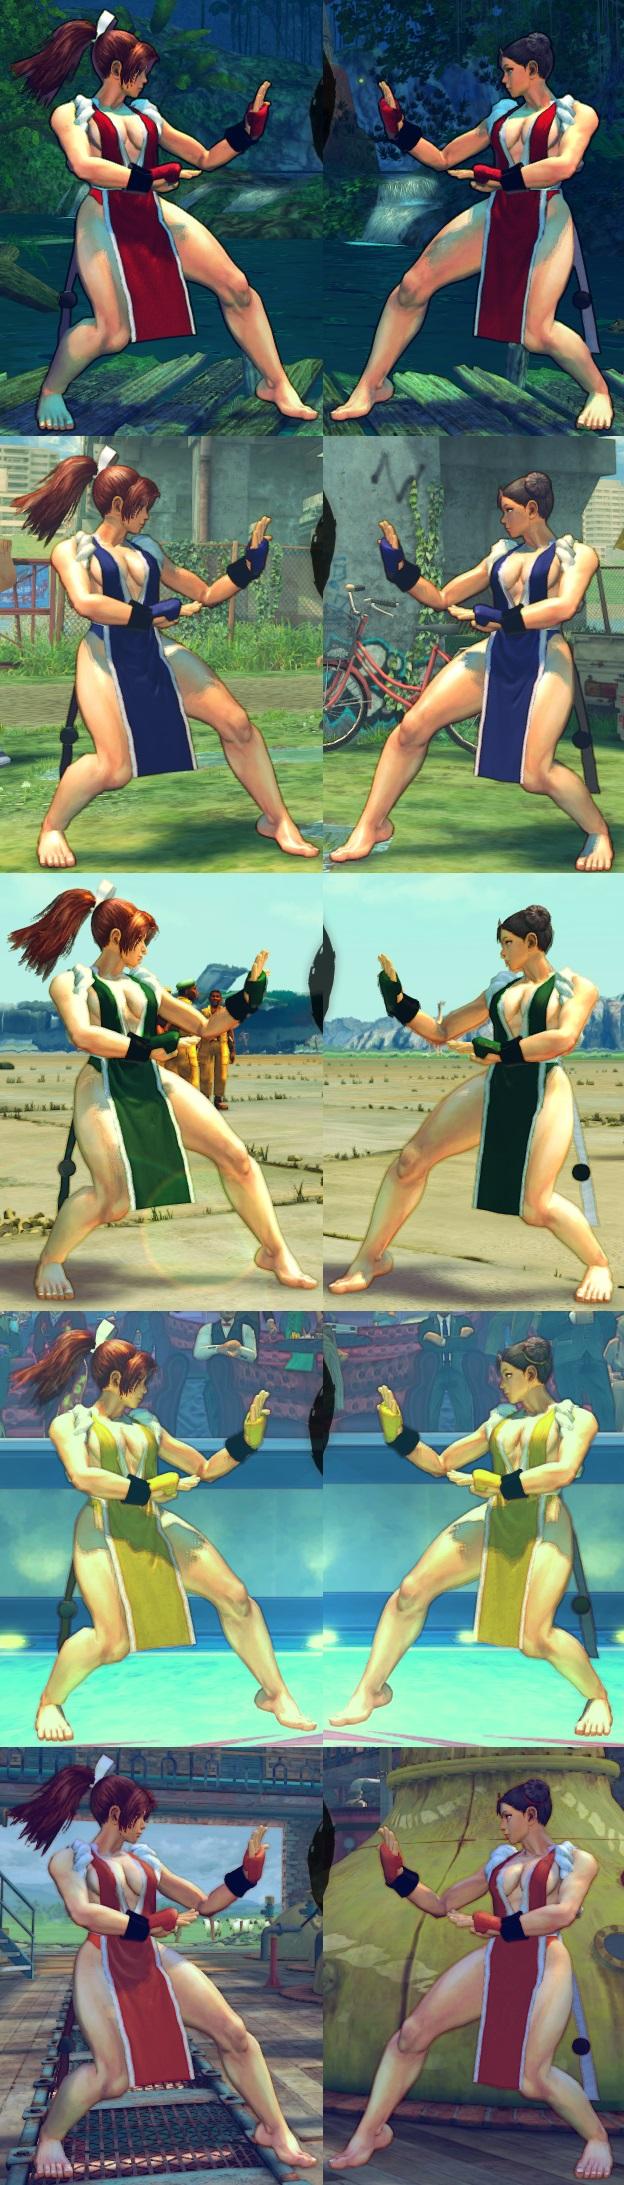 USF4 Mod - Chun Li: Mai Shiranui Cosplay (Feet) by Segadordelinks